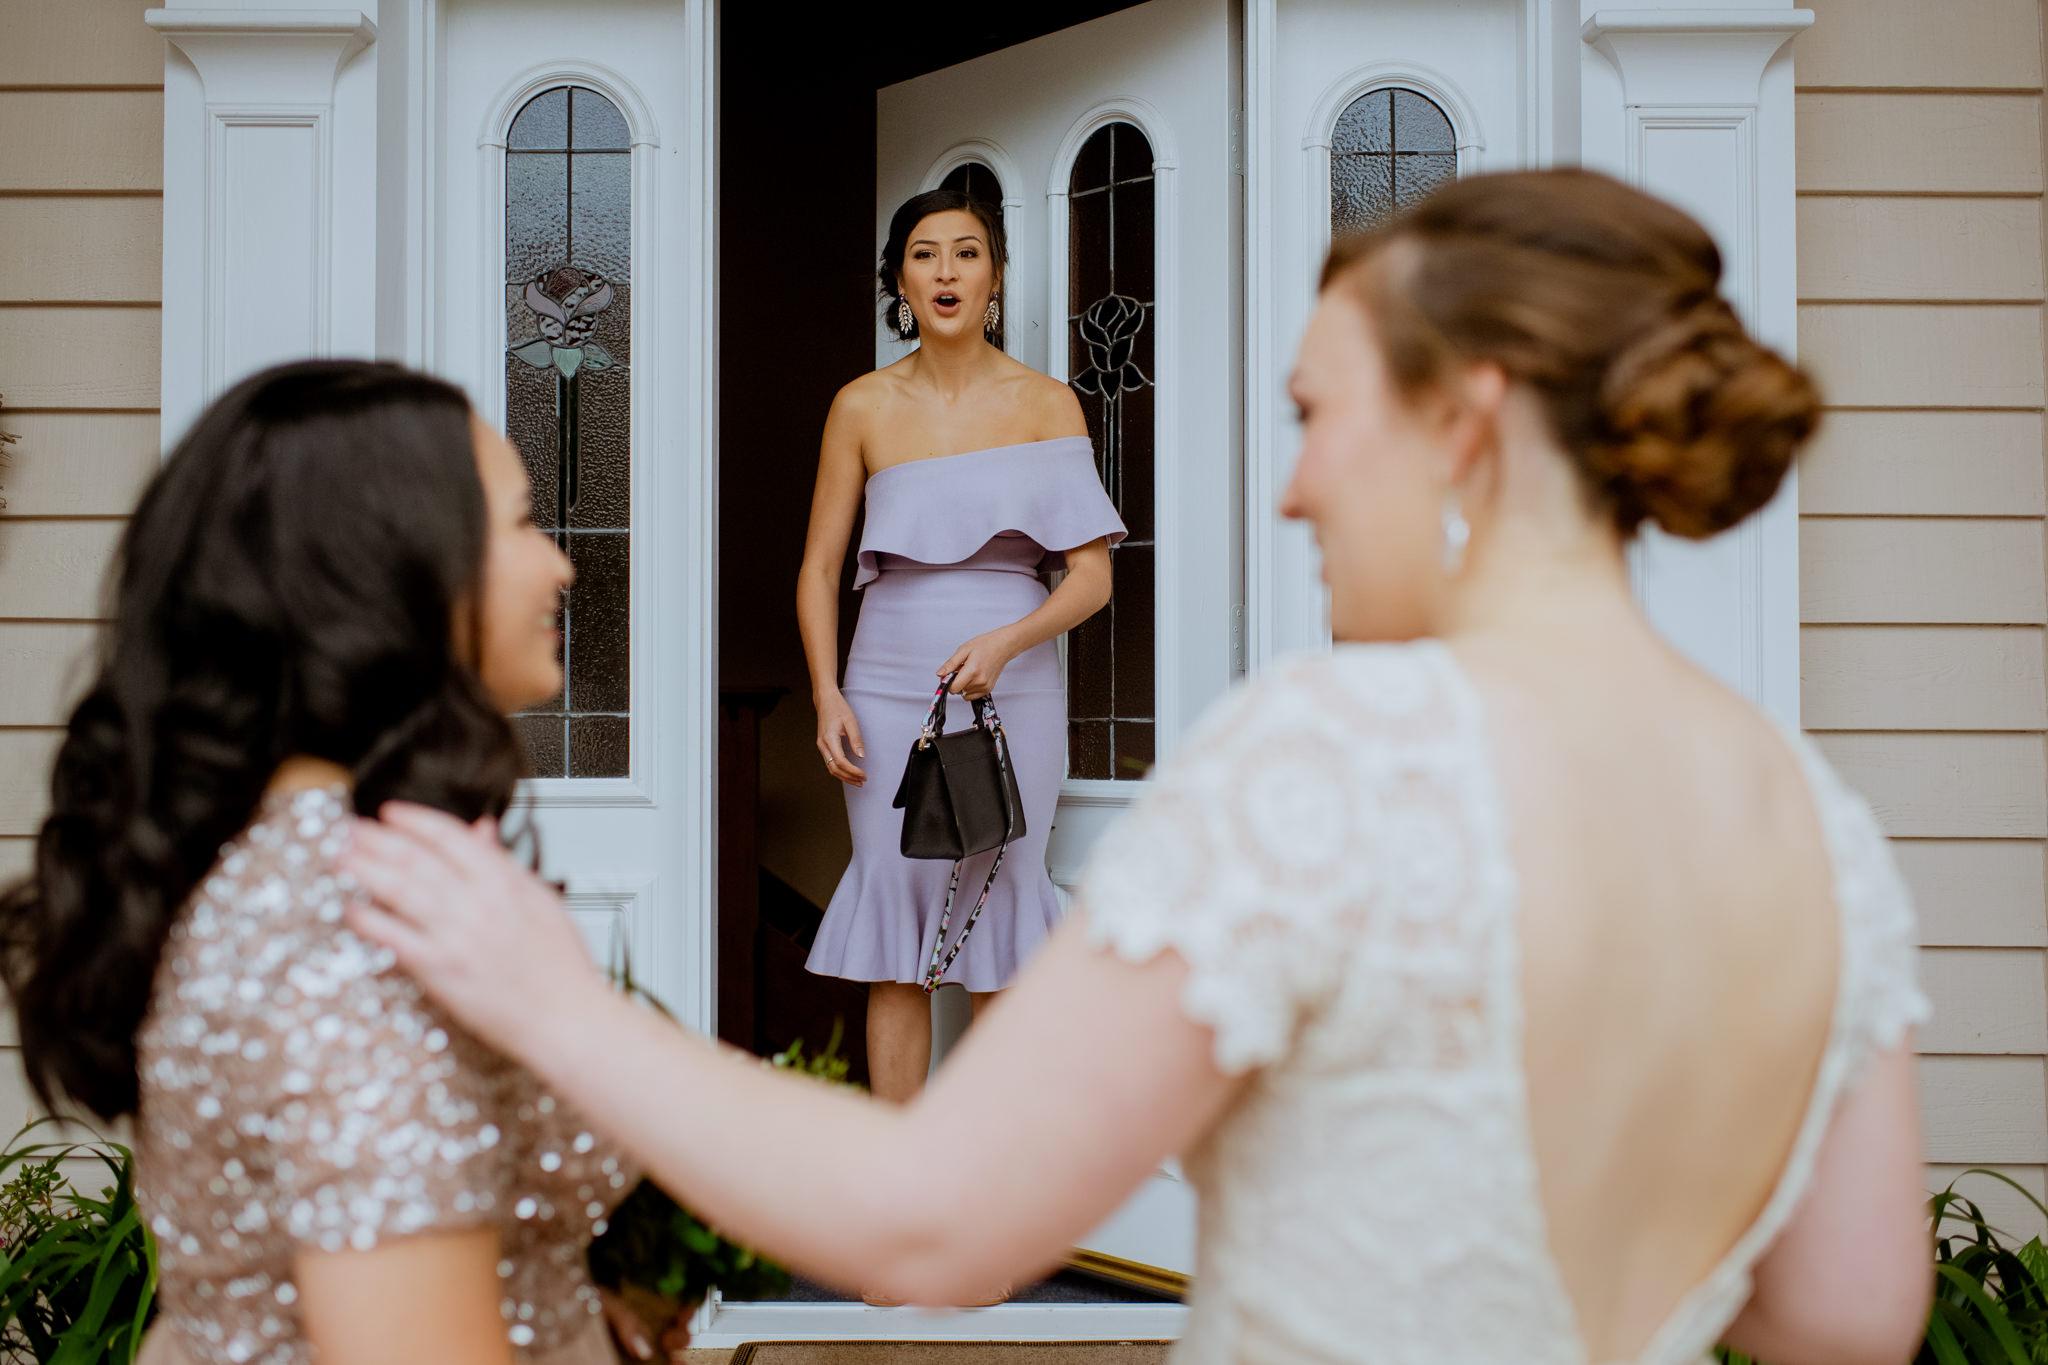 Girl in purple dress looks shocked in doorway in front of same sex couple